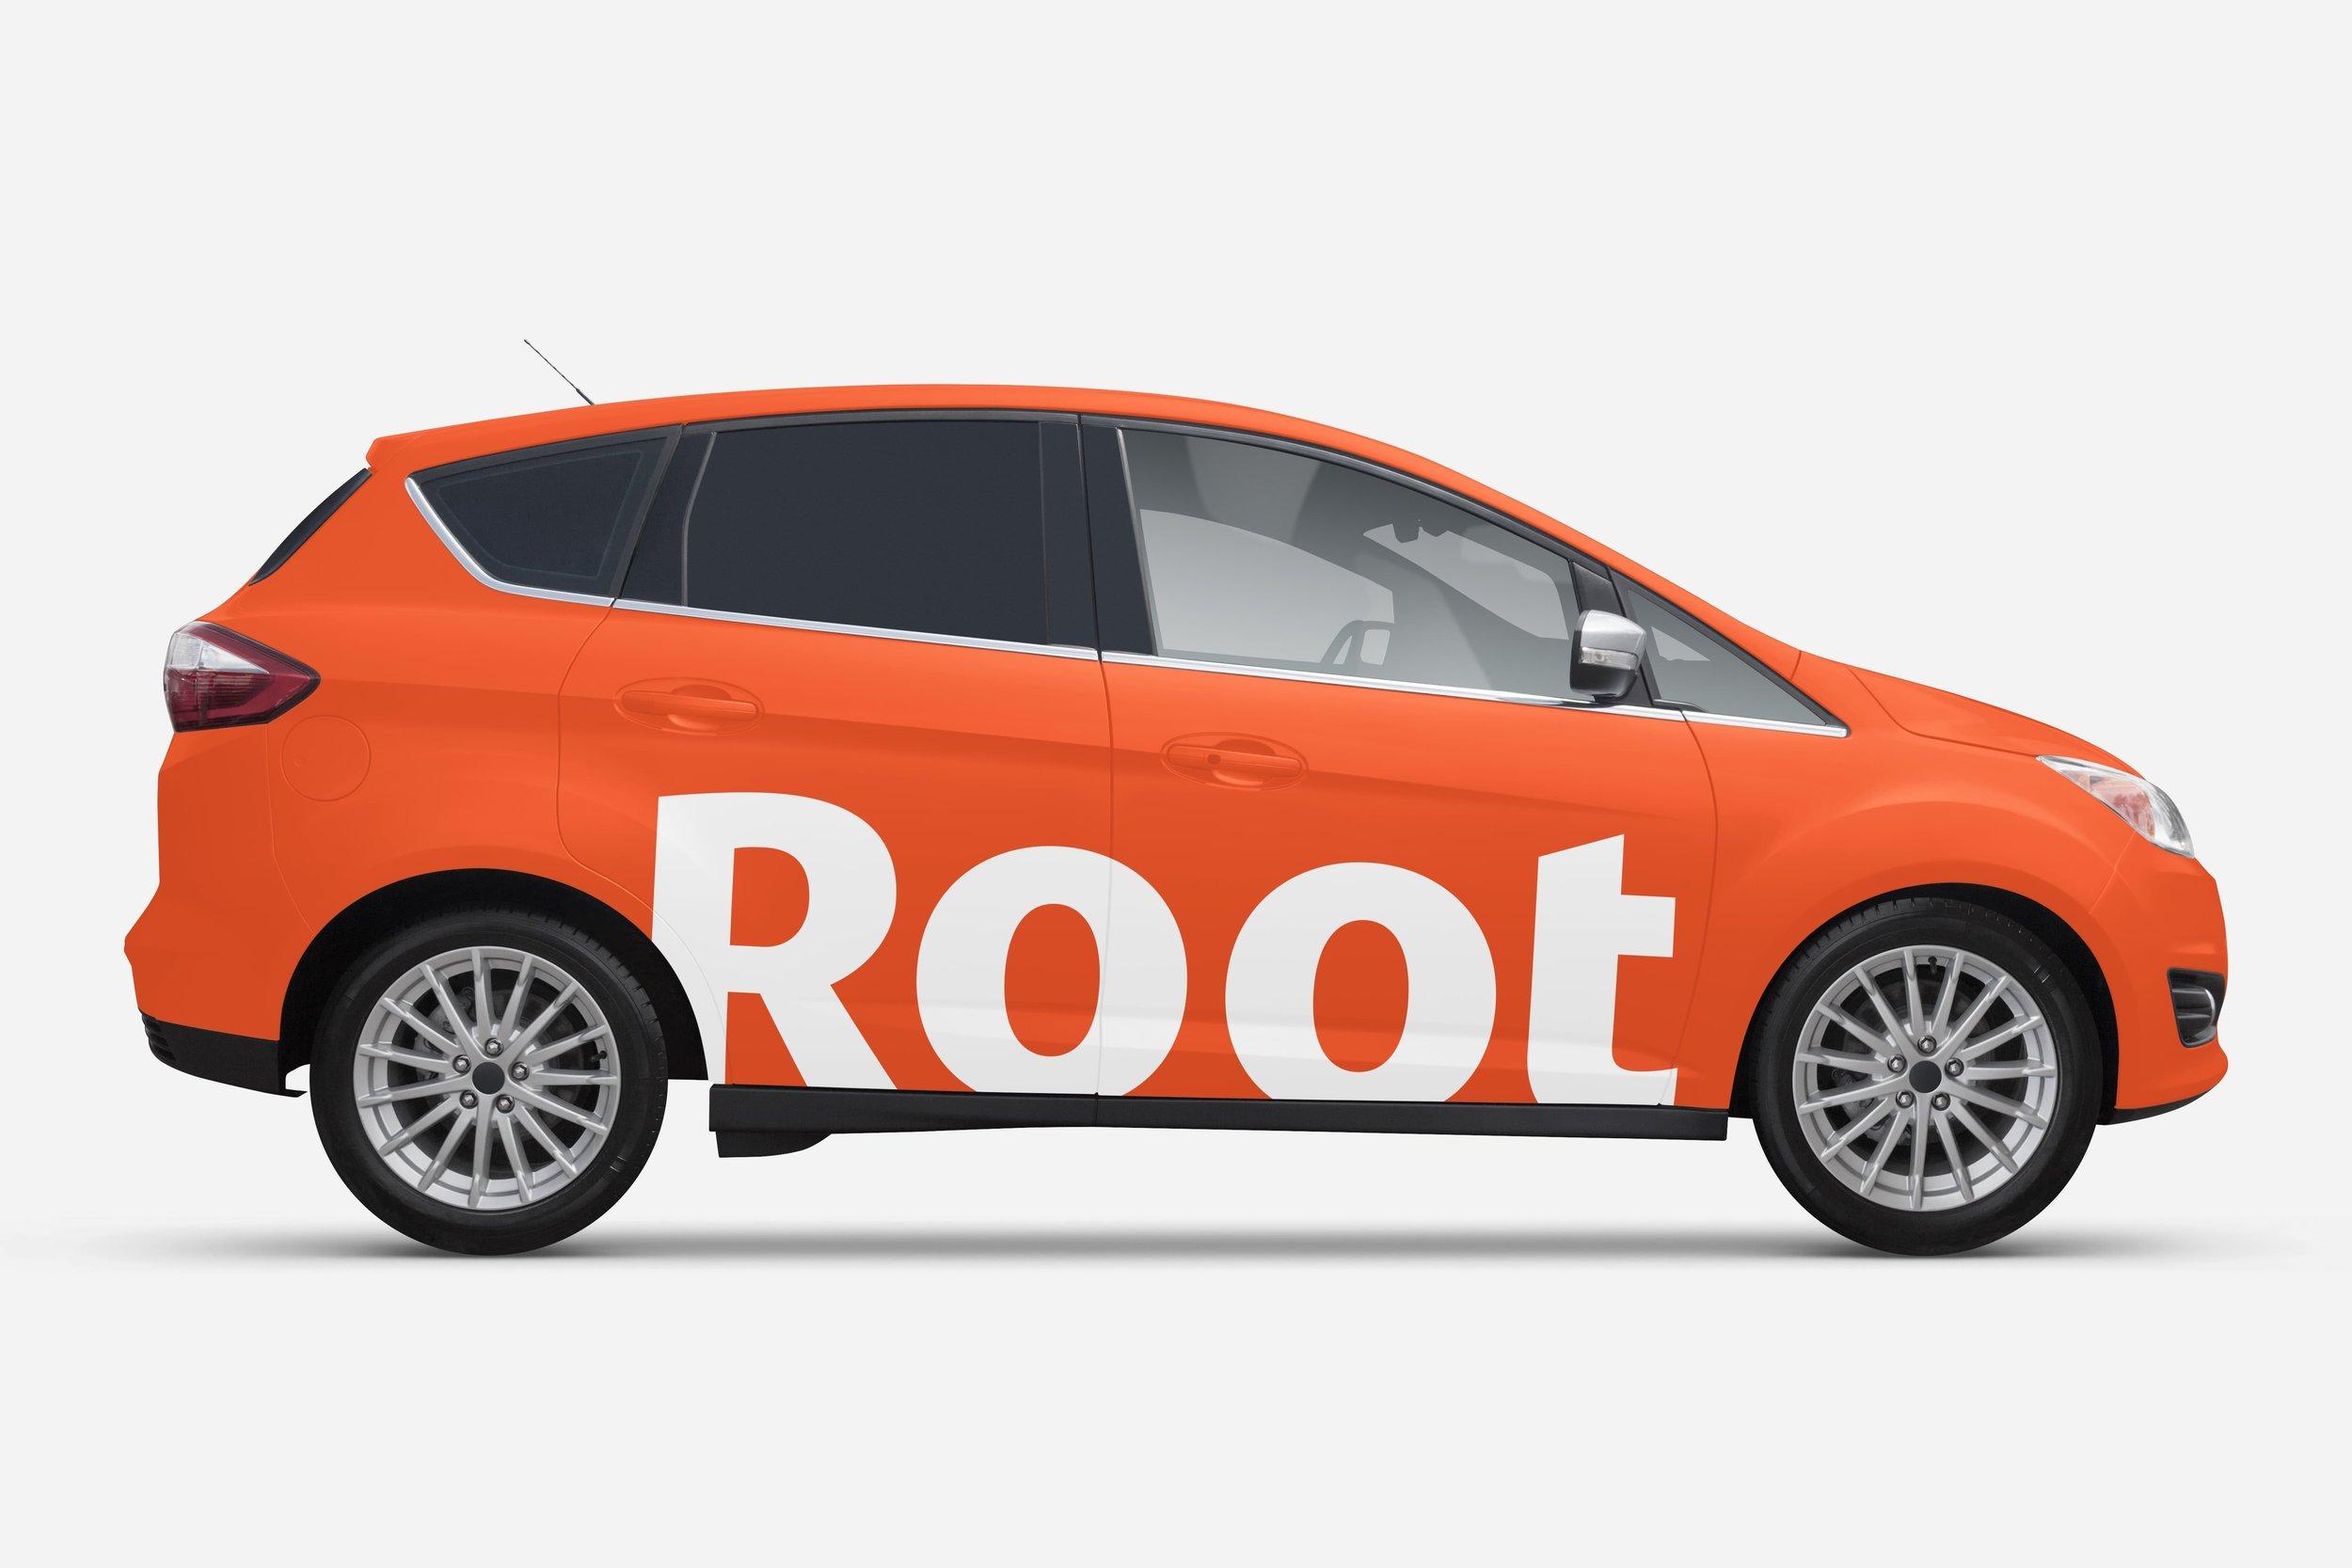 freight-root-insurance-12.jpeg